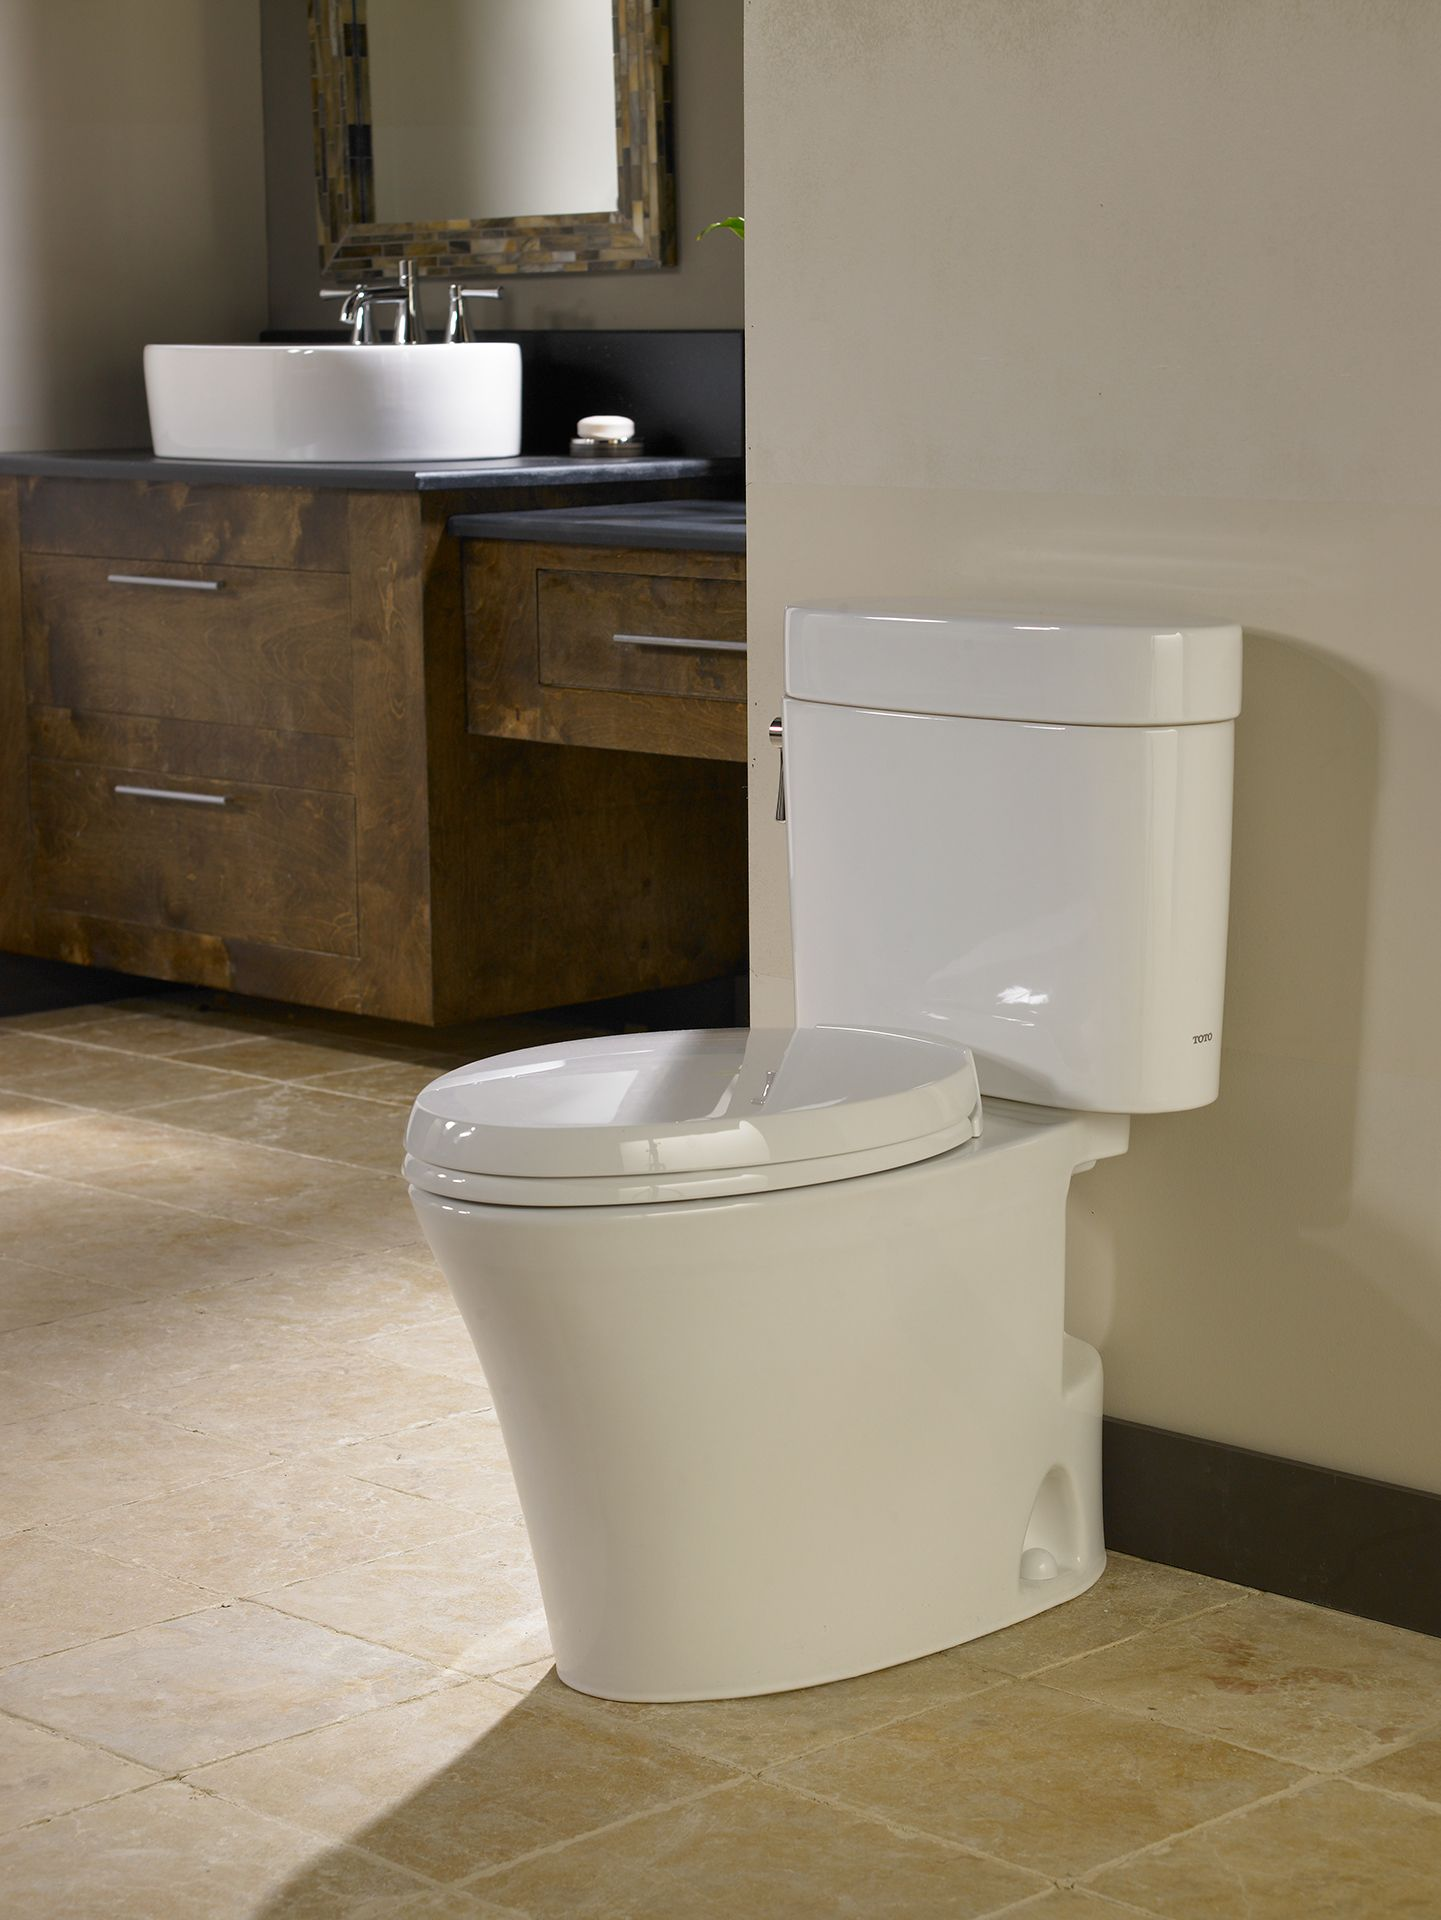 Nexus 174 Two Piece Toilet 1 6 Gpf Elongated Bowl Totousa Com